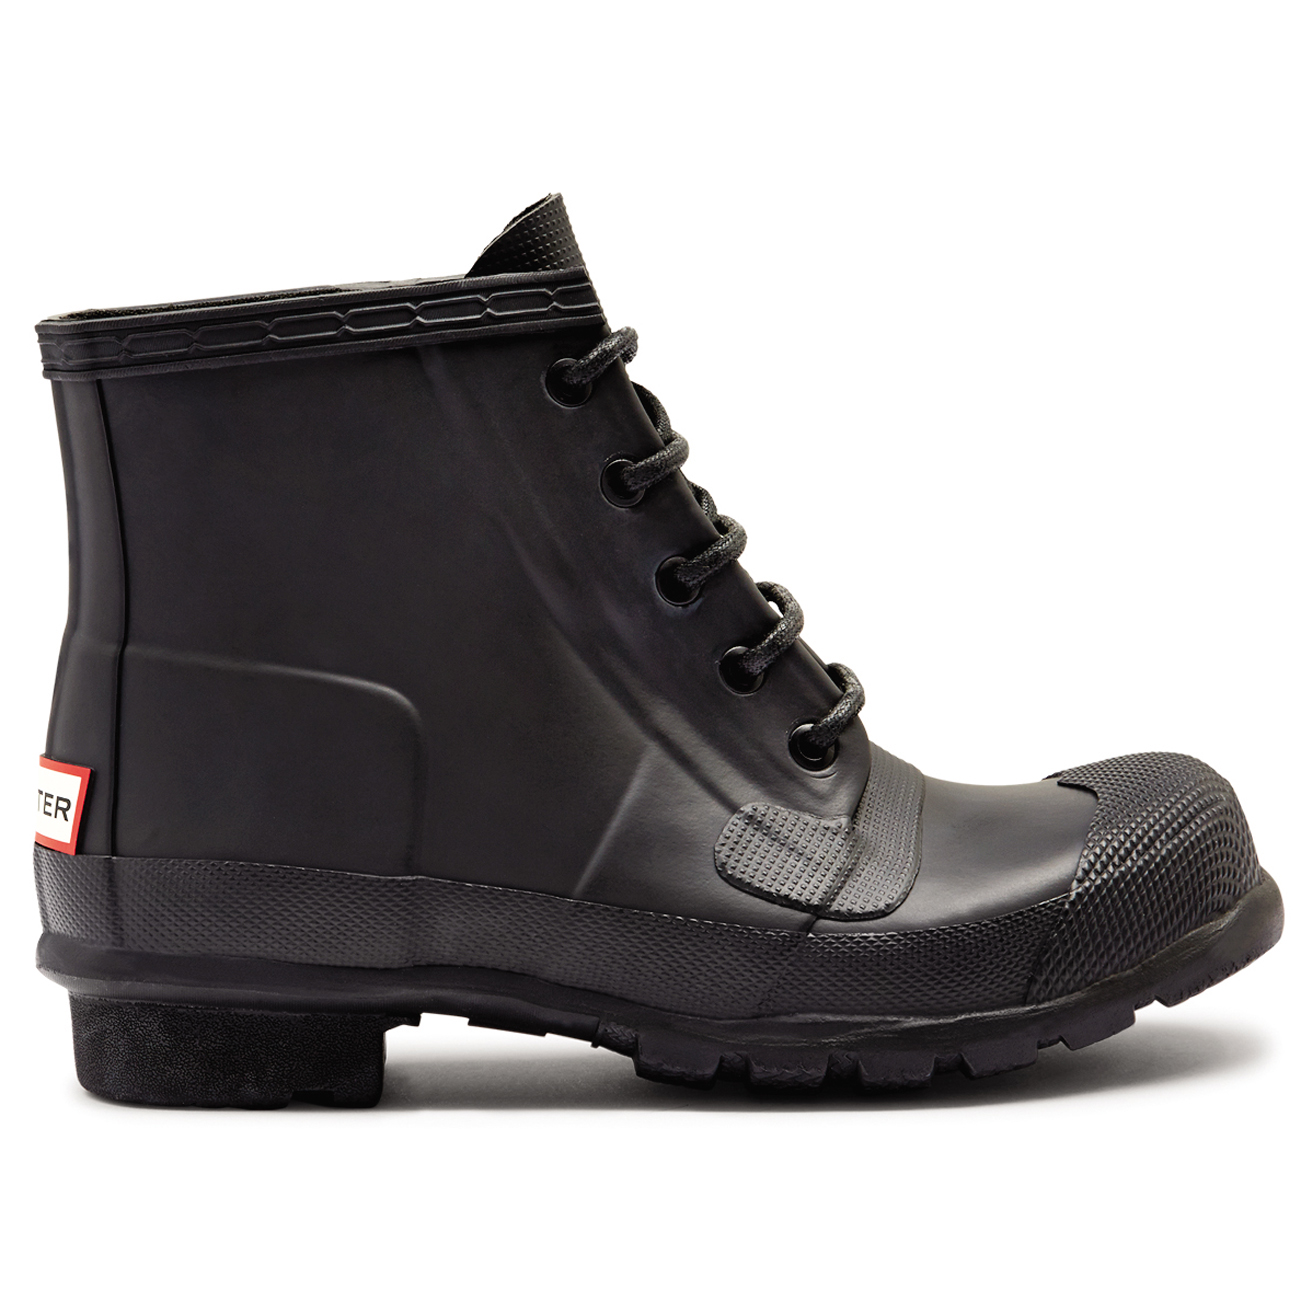 Popular Womens Hunter Original Refined Waterproof Snow Wellingtons Rain Boots US 5-11 | EBay